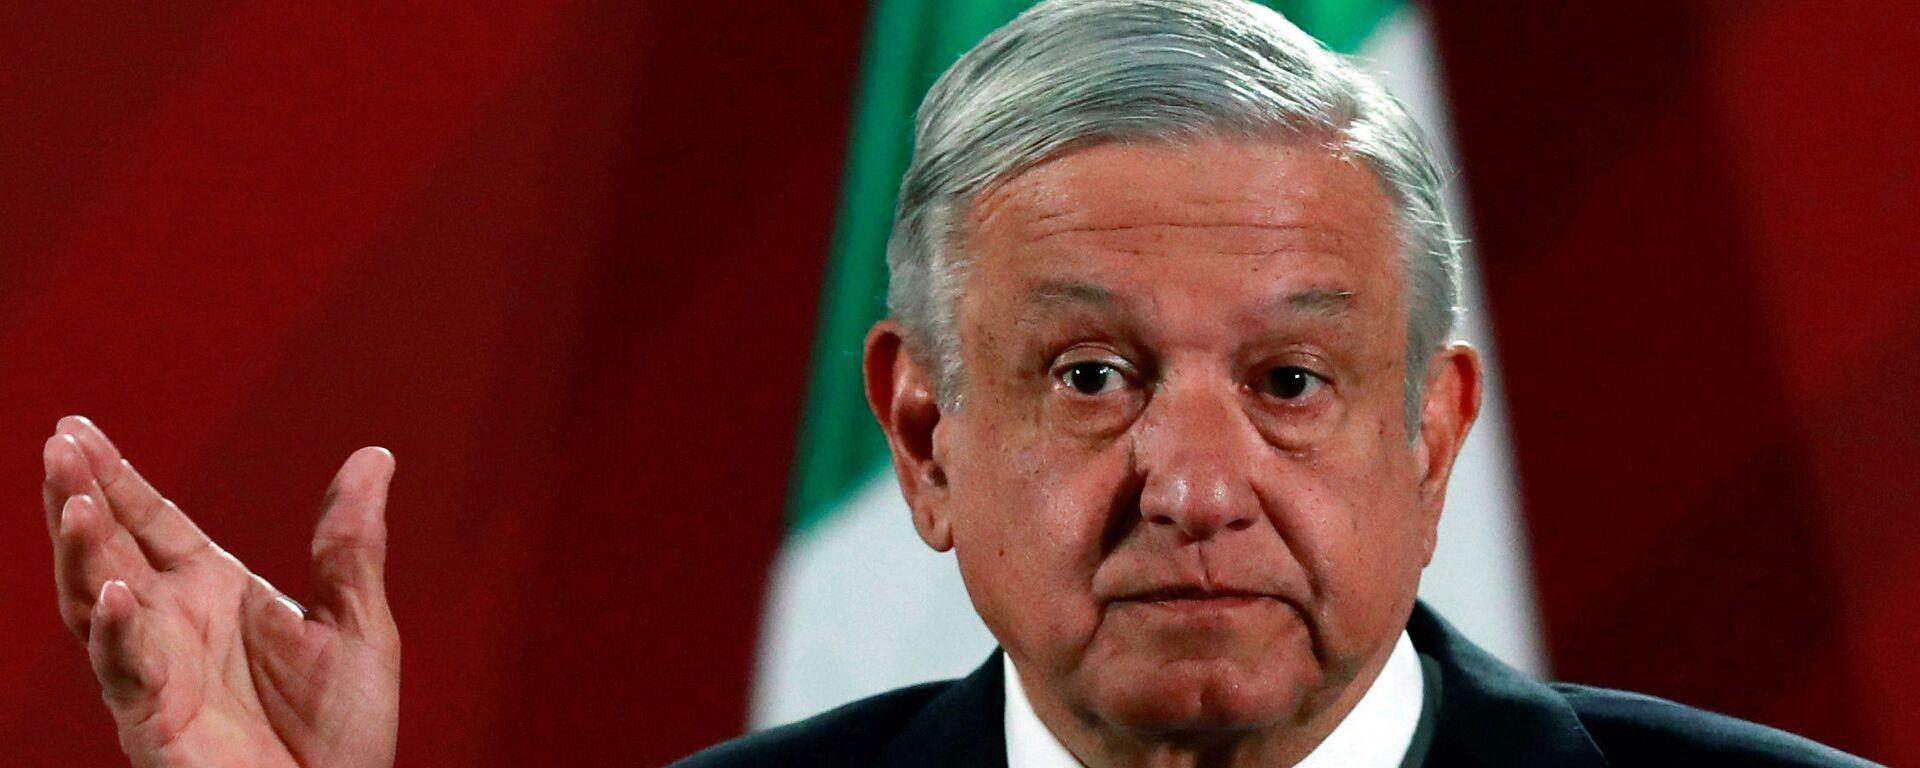 Andrés Manuel López Obrador, presidente mexicano - Sputnik Mundo, 1920, 01.09.2020